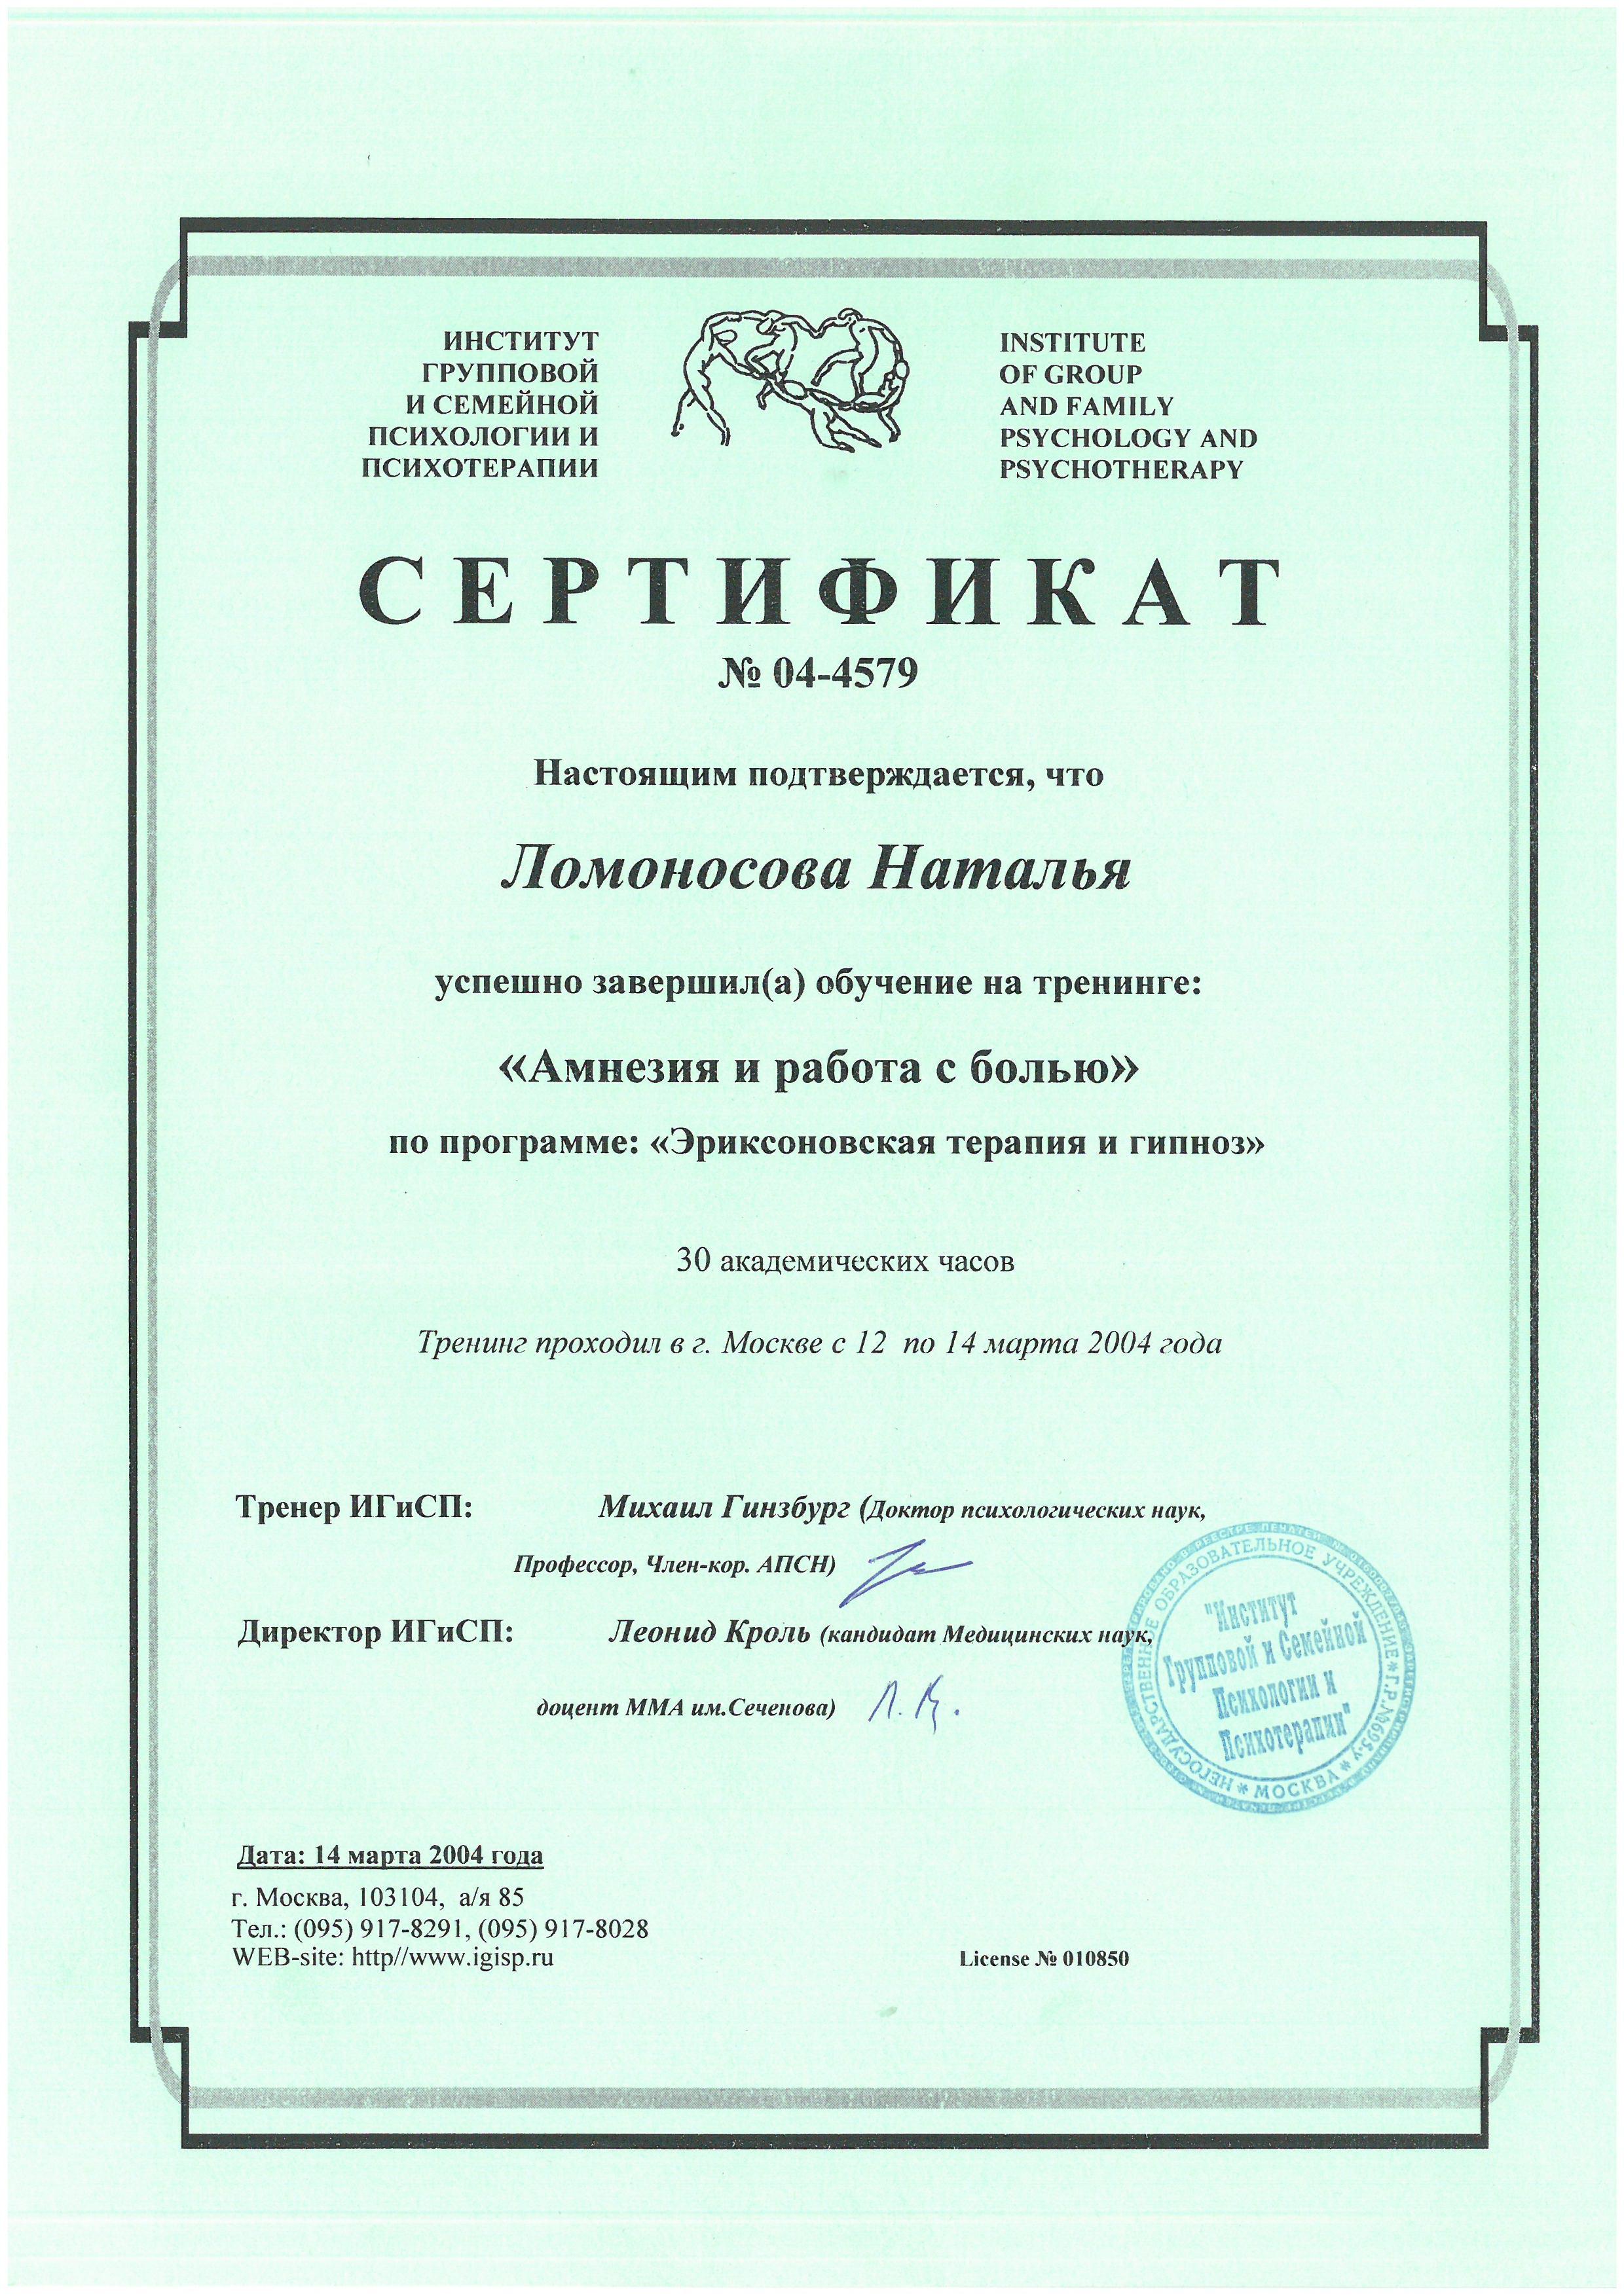 SKMBT_C224e17060618120_Сторінка_27.jpg